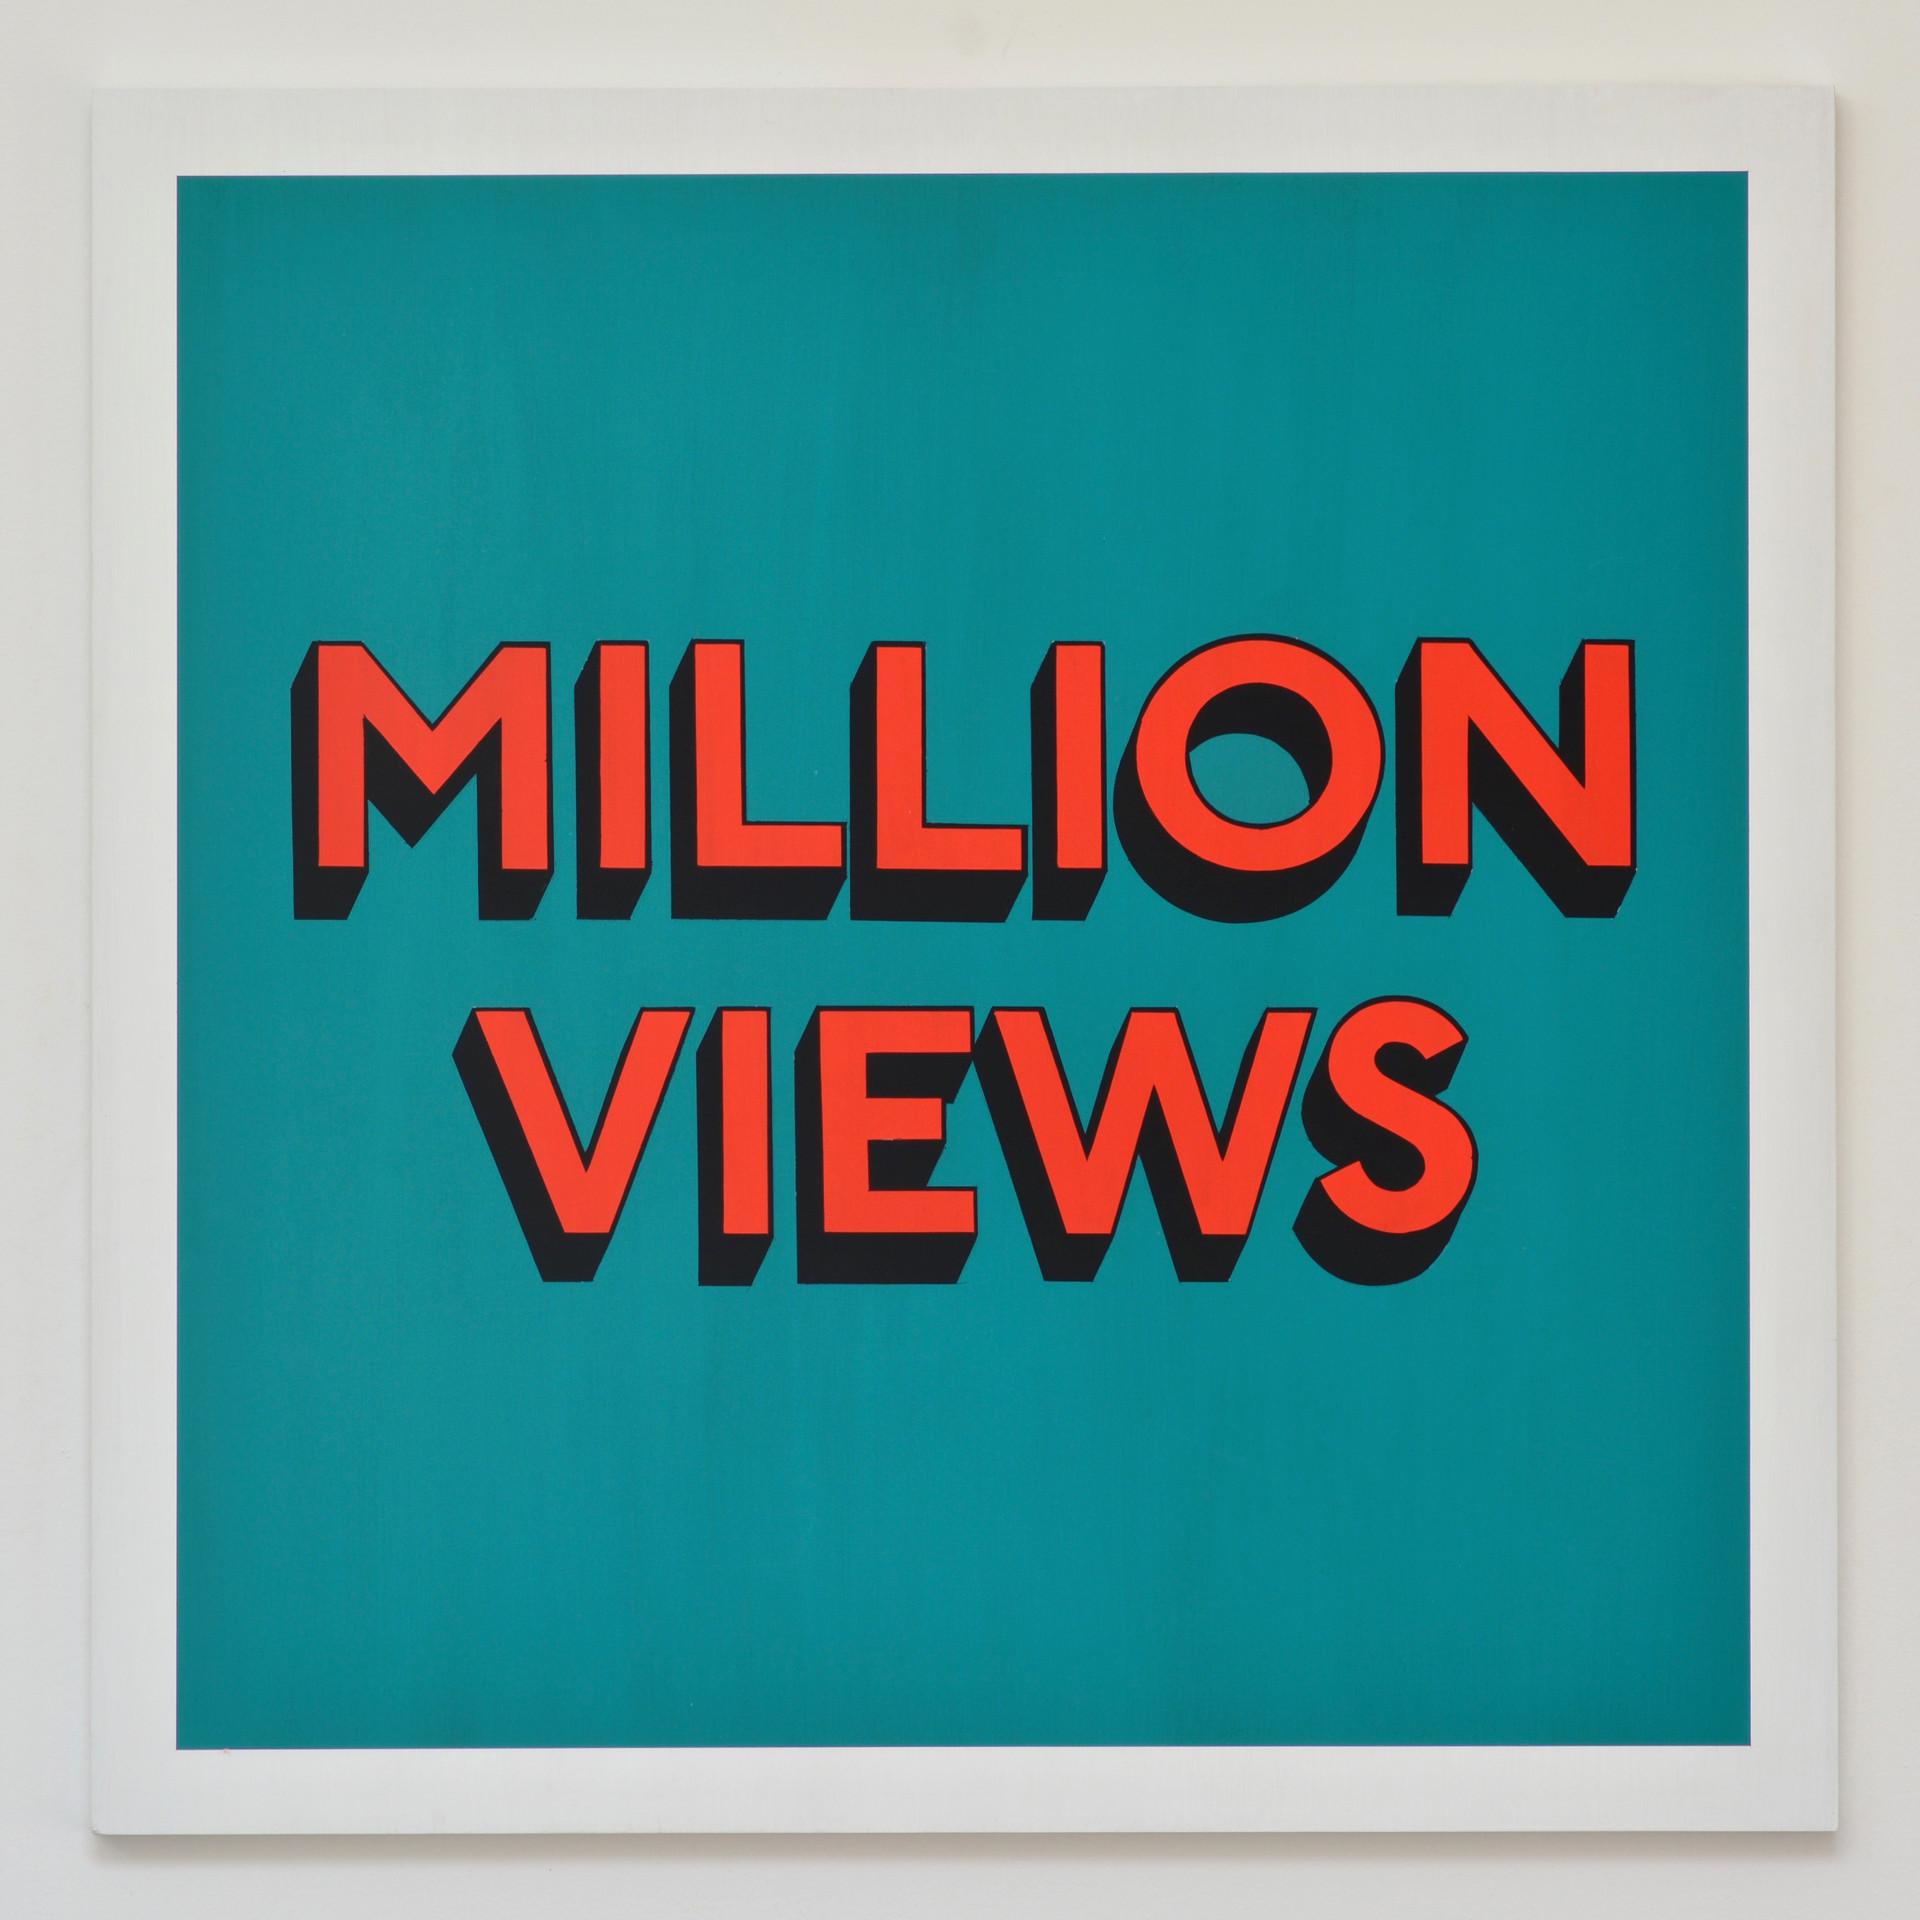 MILLION_VIEWS.jpg